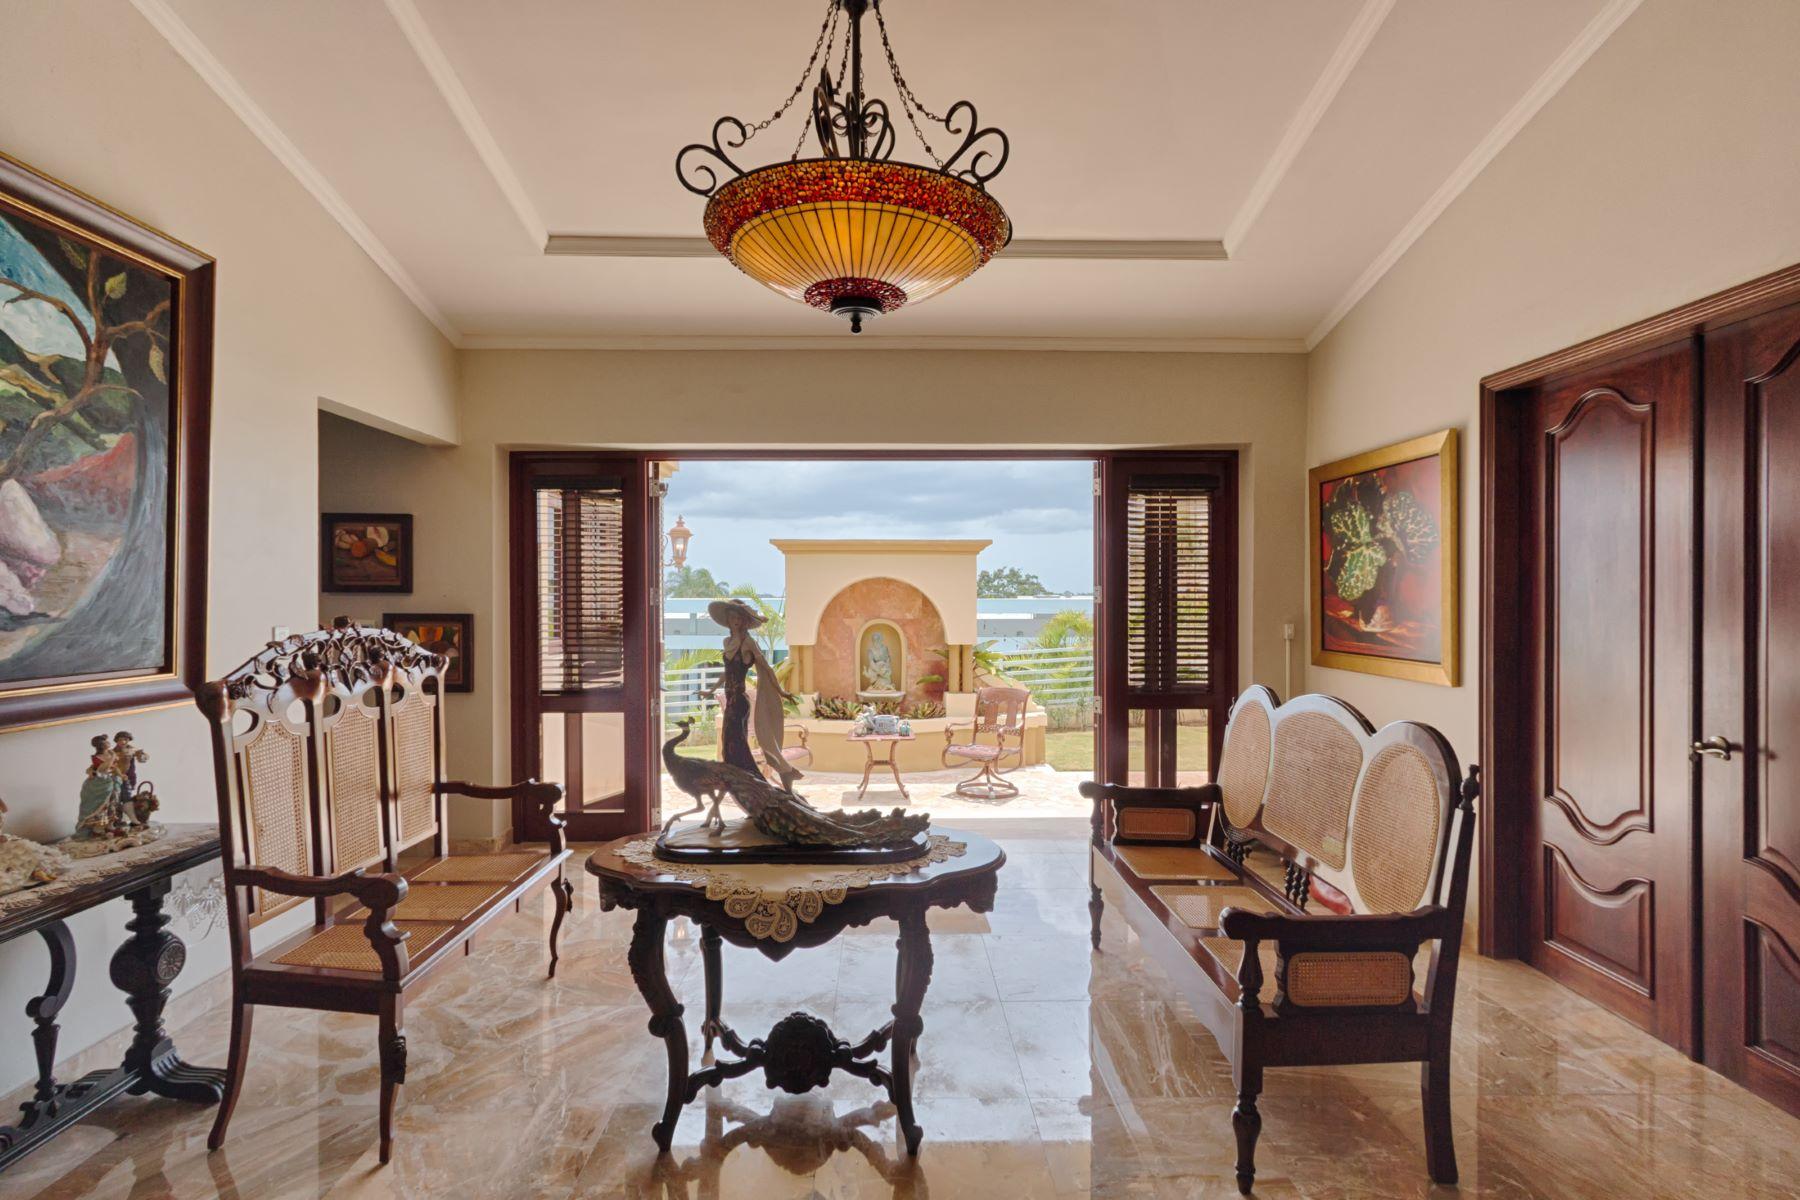 Additional photo for property listing at Opulent Designer Estate 95 Mirador Street. Paseo Alto Los Paseos San Juan, 00926 Puerto Rico